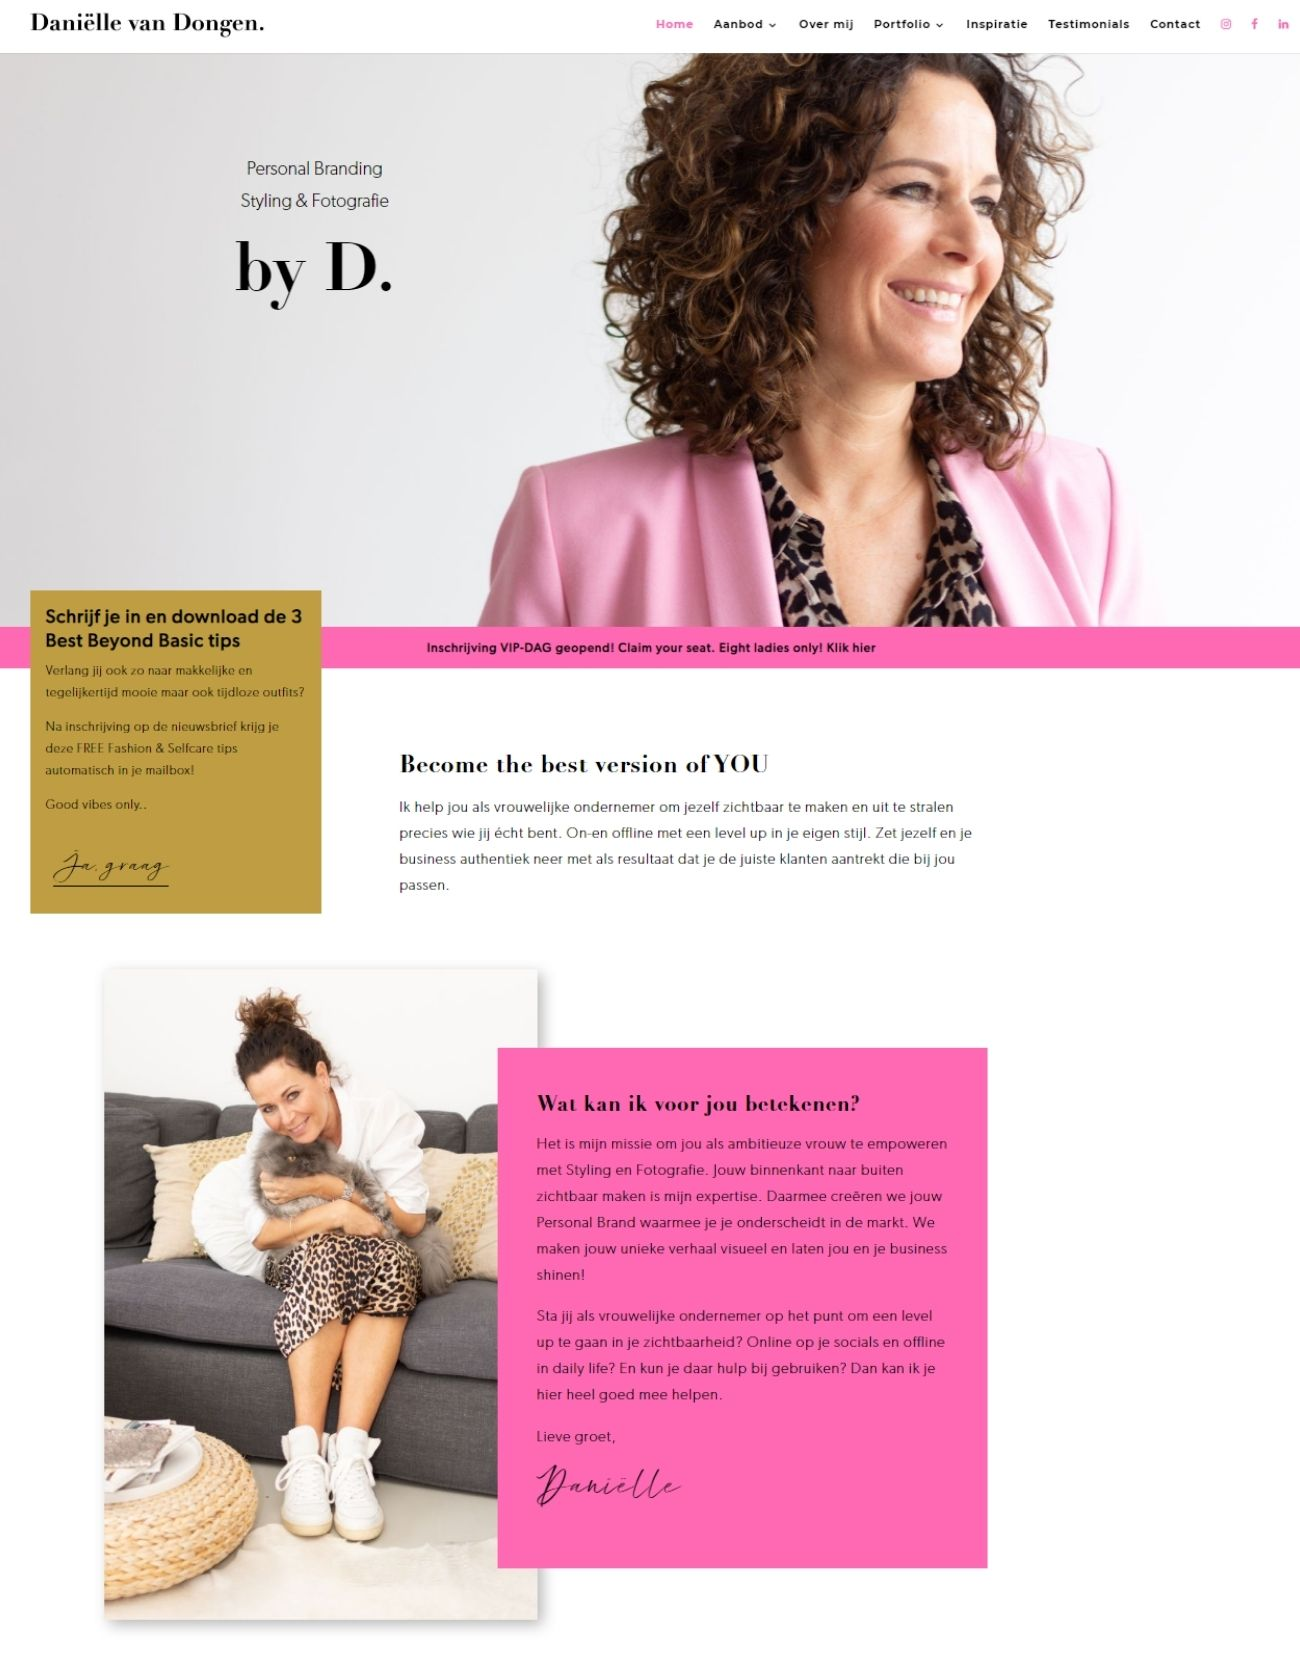 Impressie Danielle van Dongen Paula Terpstra Webdesign homepage